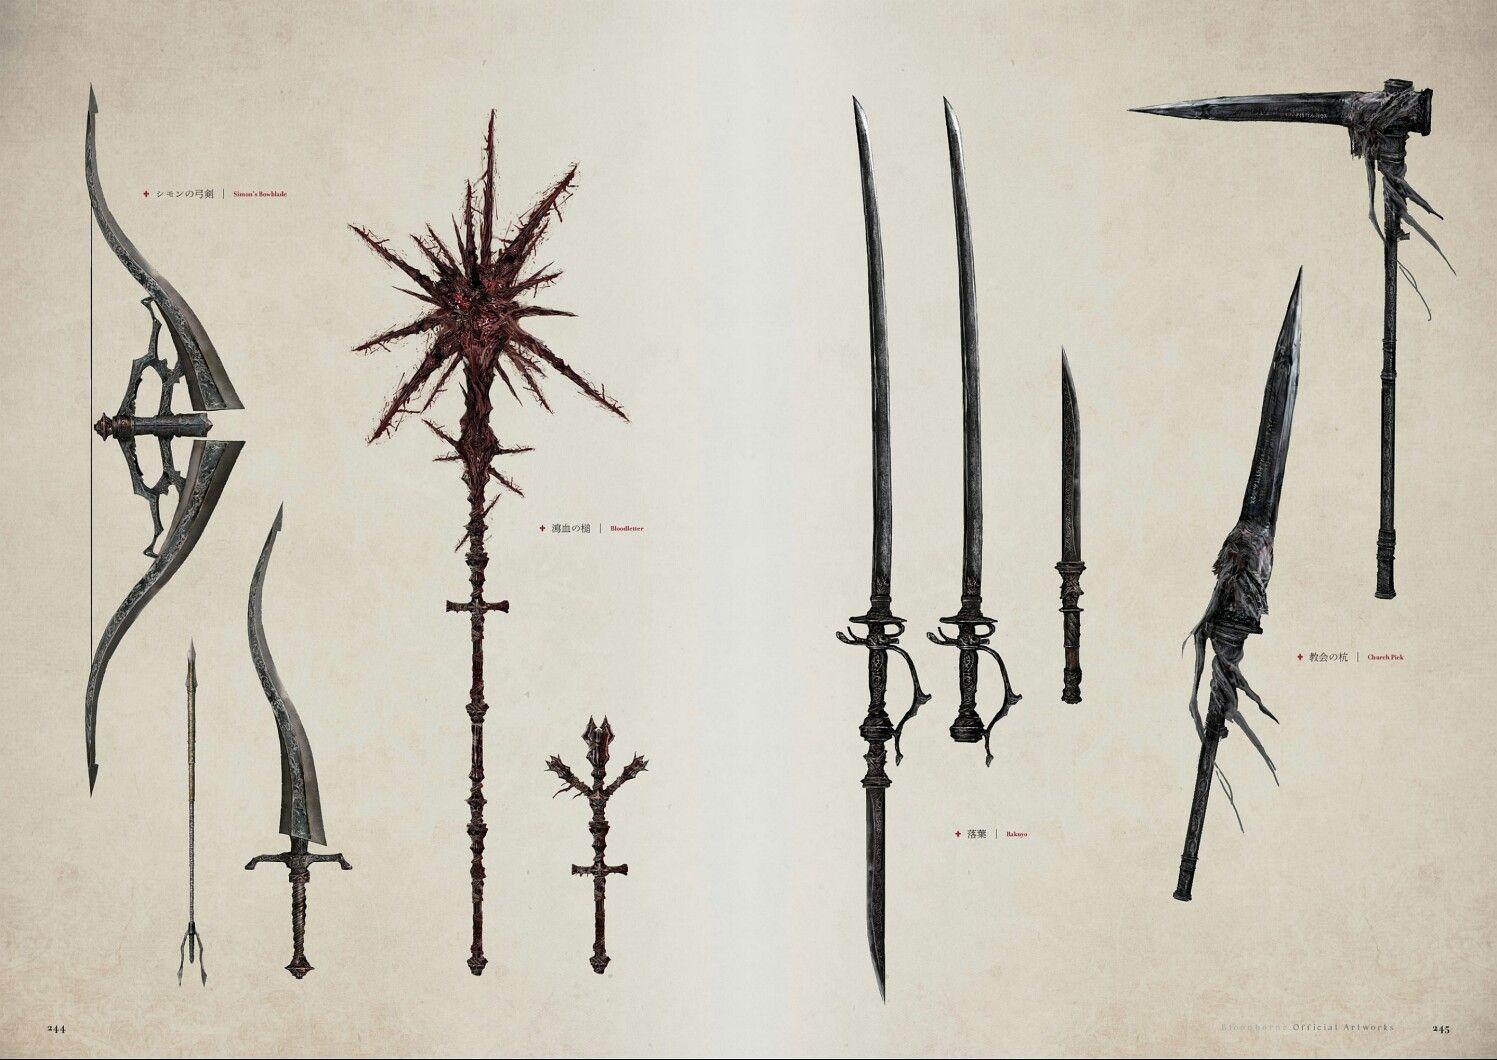 Artsy Fartsy Dark Souls Ii Concept Art: Bloodborne Concept Art - Weapon Concept Art